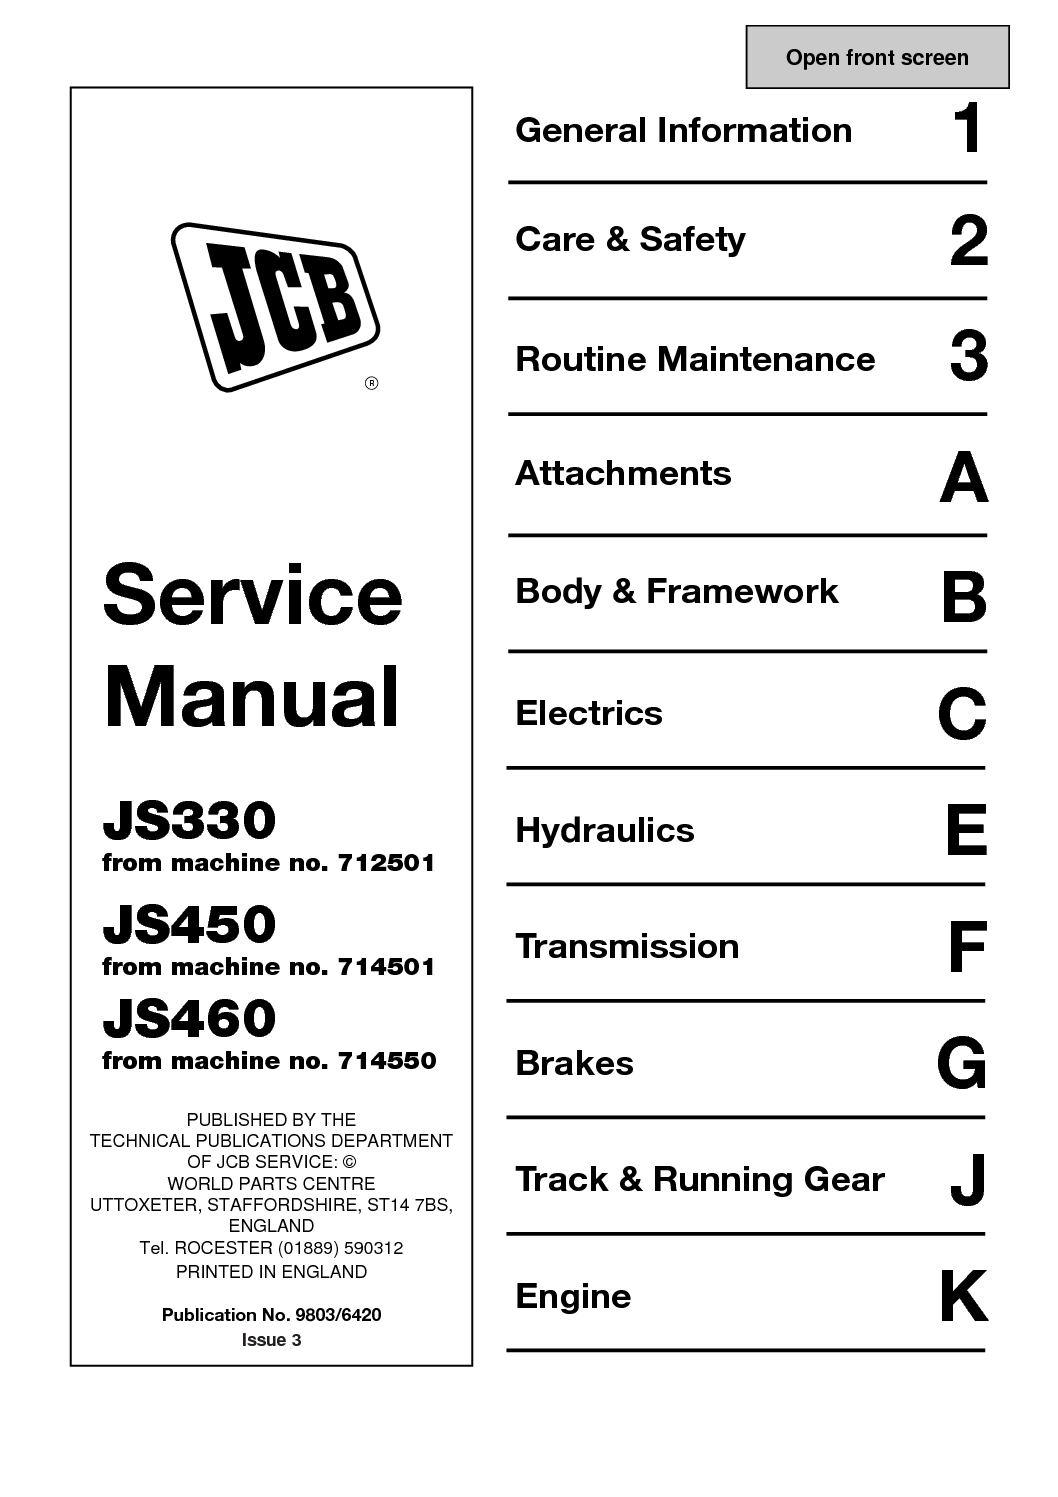 Calaméo - JCB JS450 TRACKED EXCAVATOR Service Repair Manual SN714501 Onwards